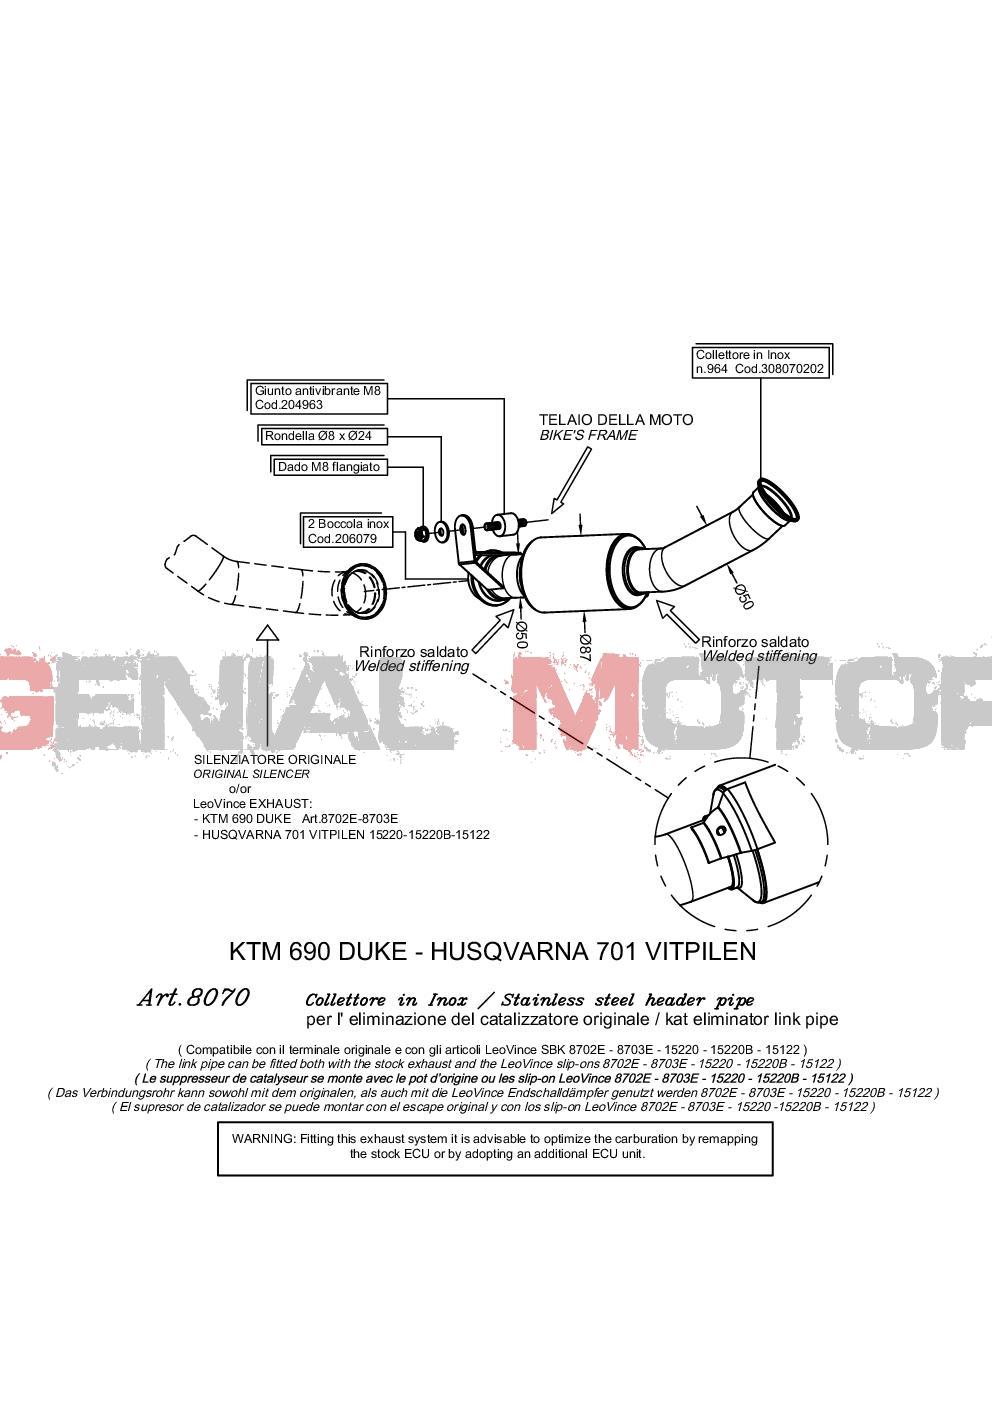 8070 Kit link pipe Leovince SBK eliminating the kat KTM 690 DUKE